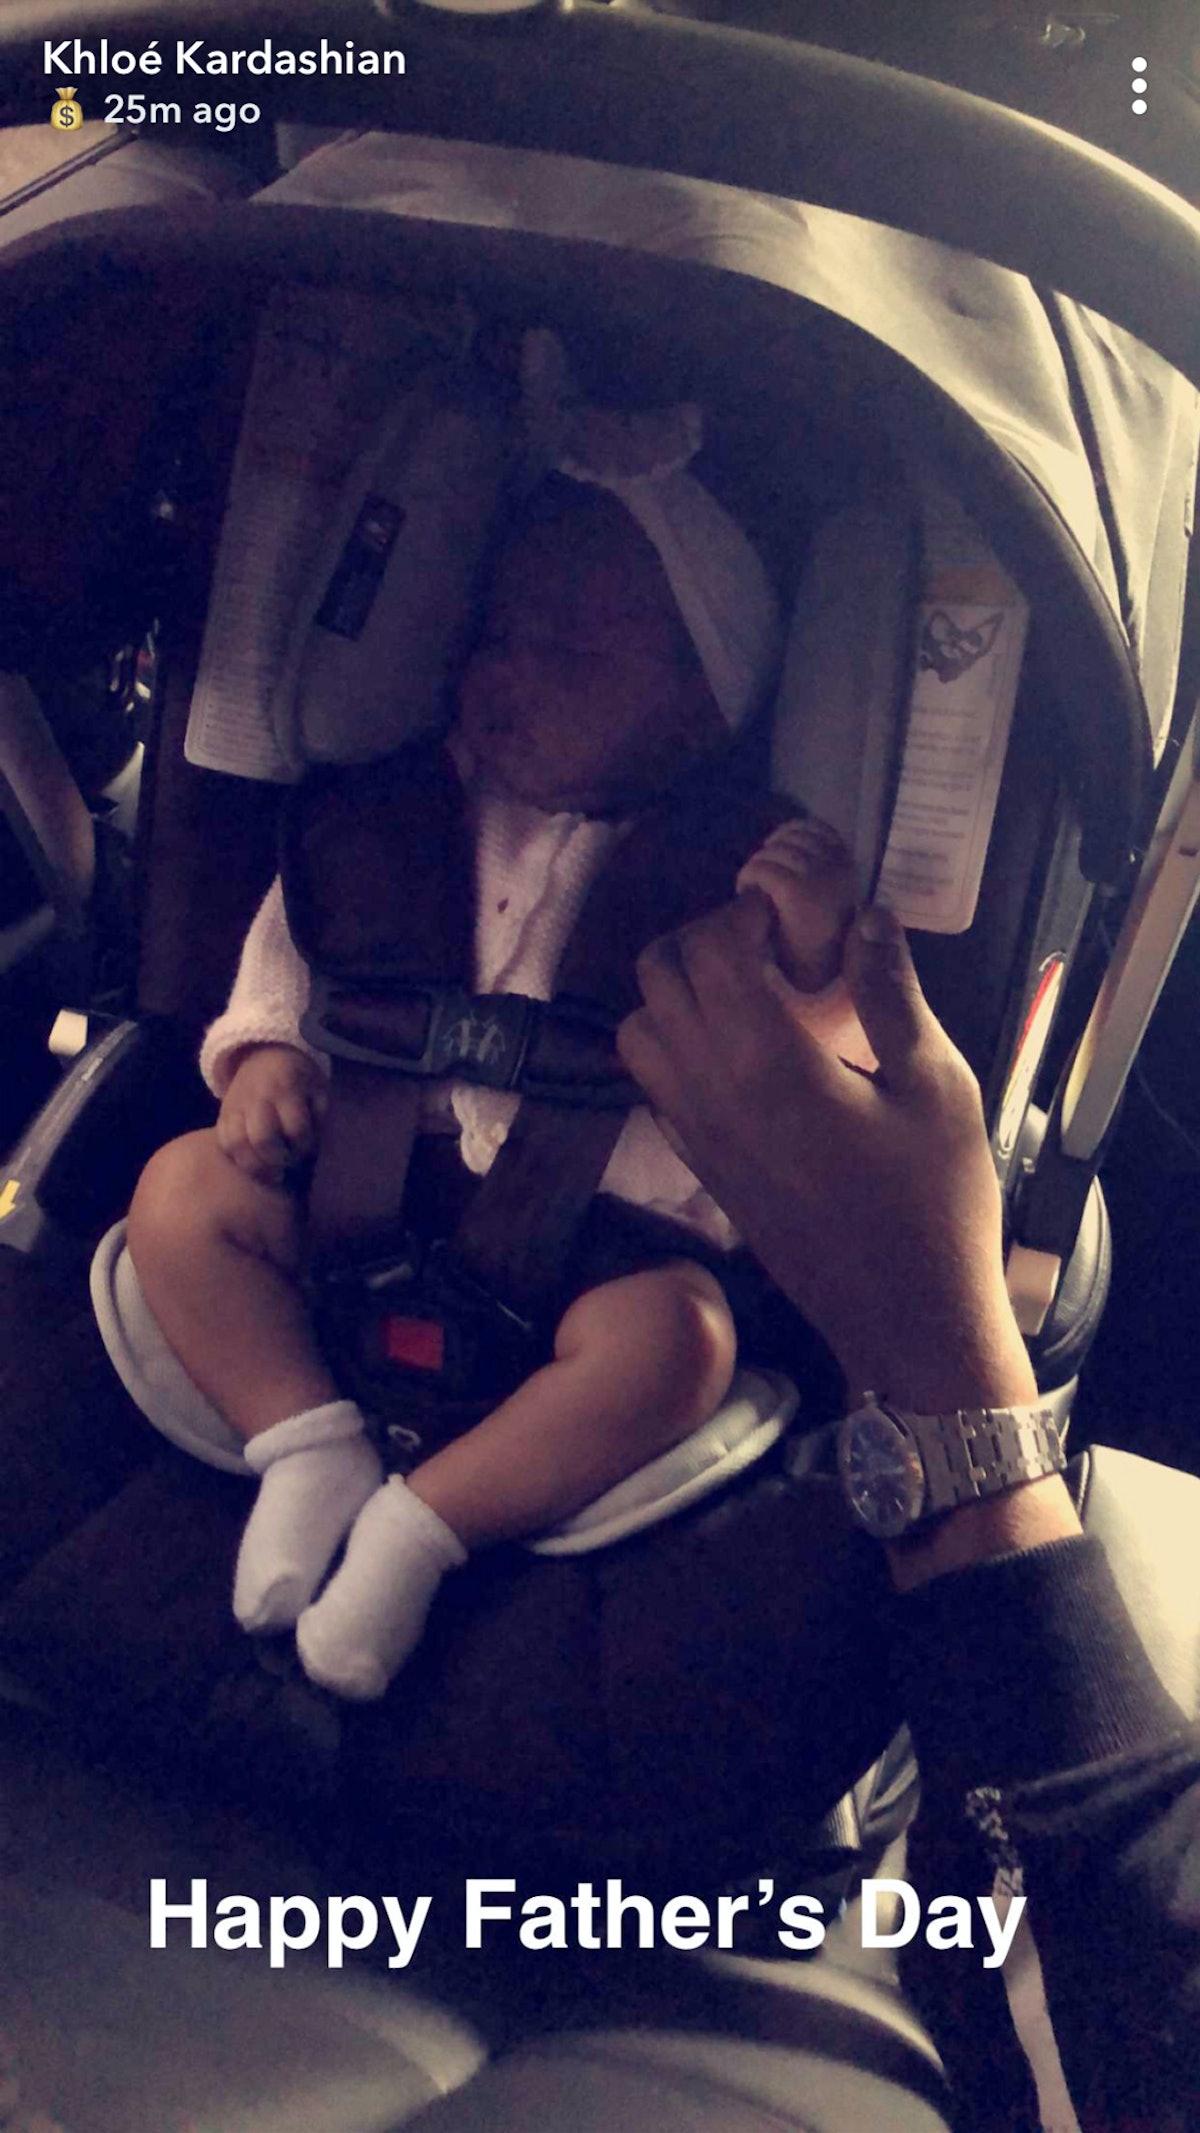 Khloe-Kardashian-Tristan-Thompson-Fathers-Day-True-Snapchat.jpg